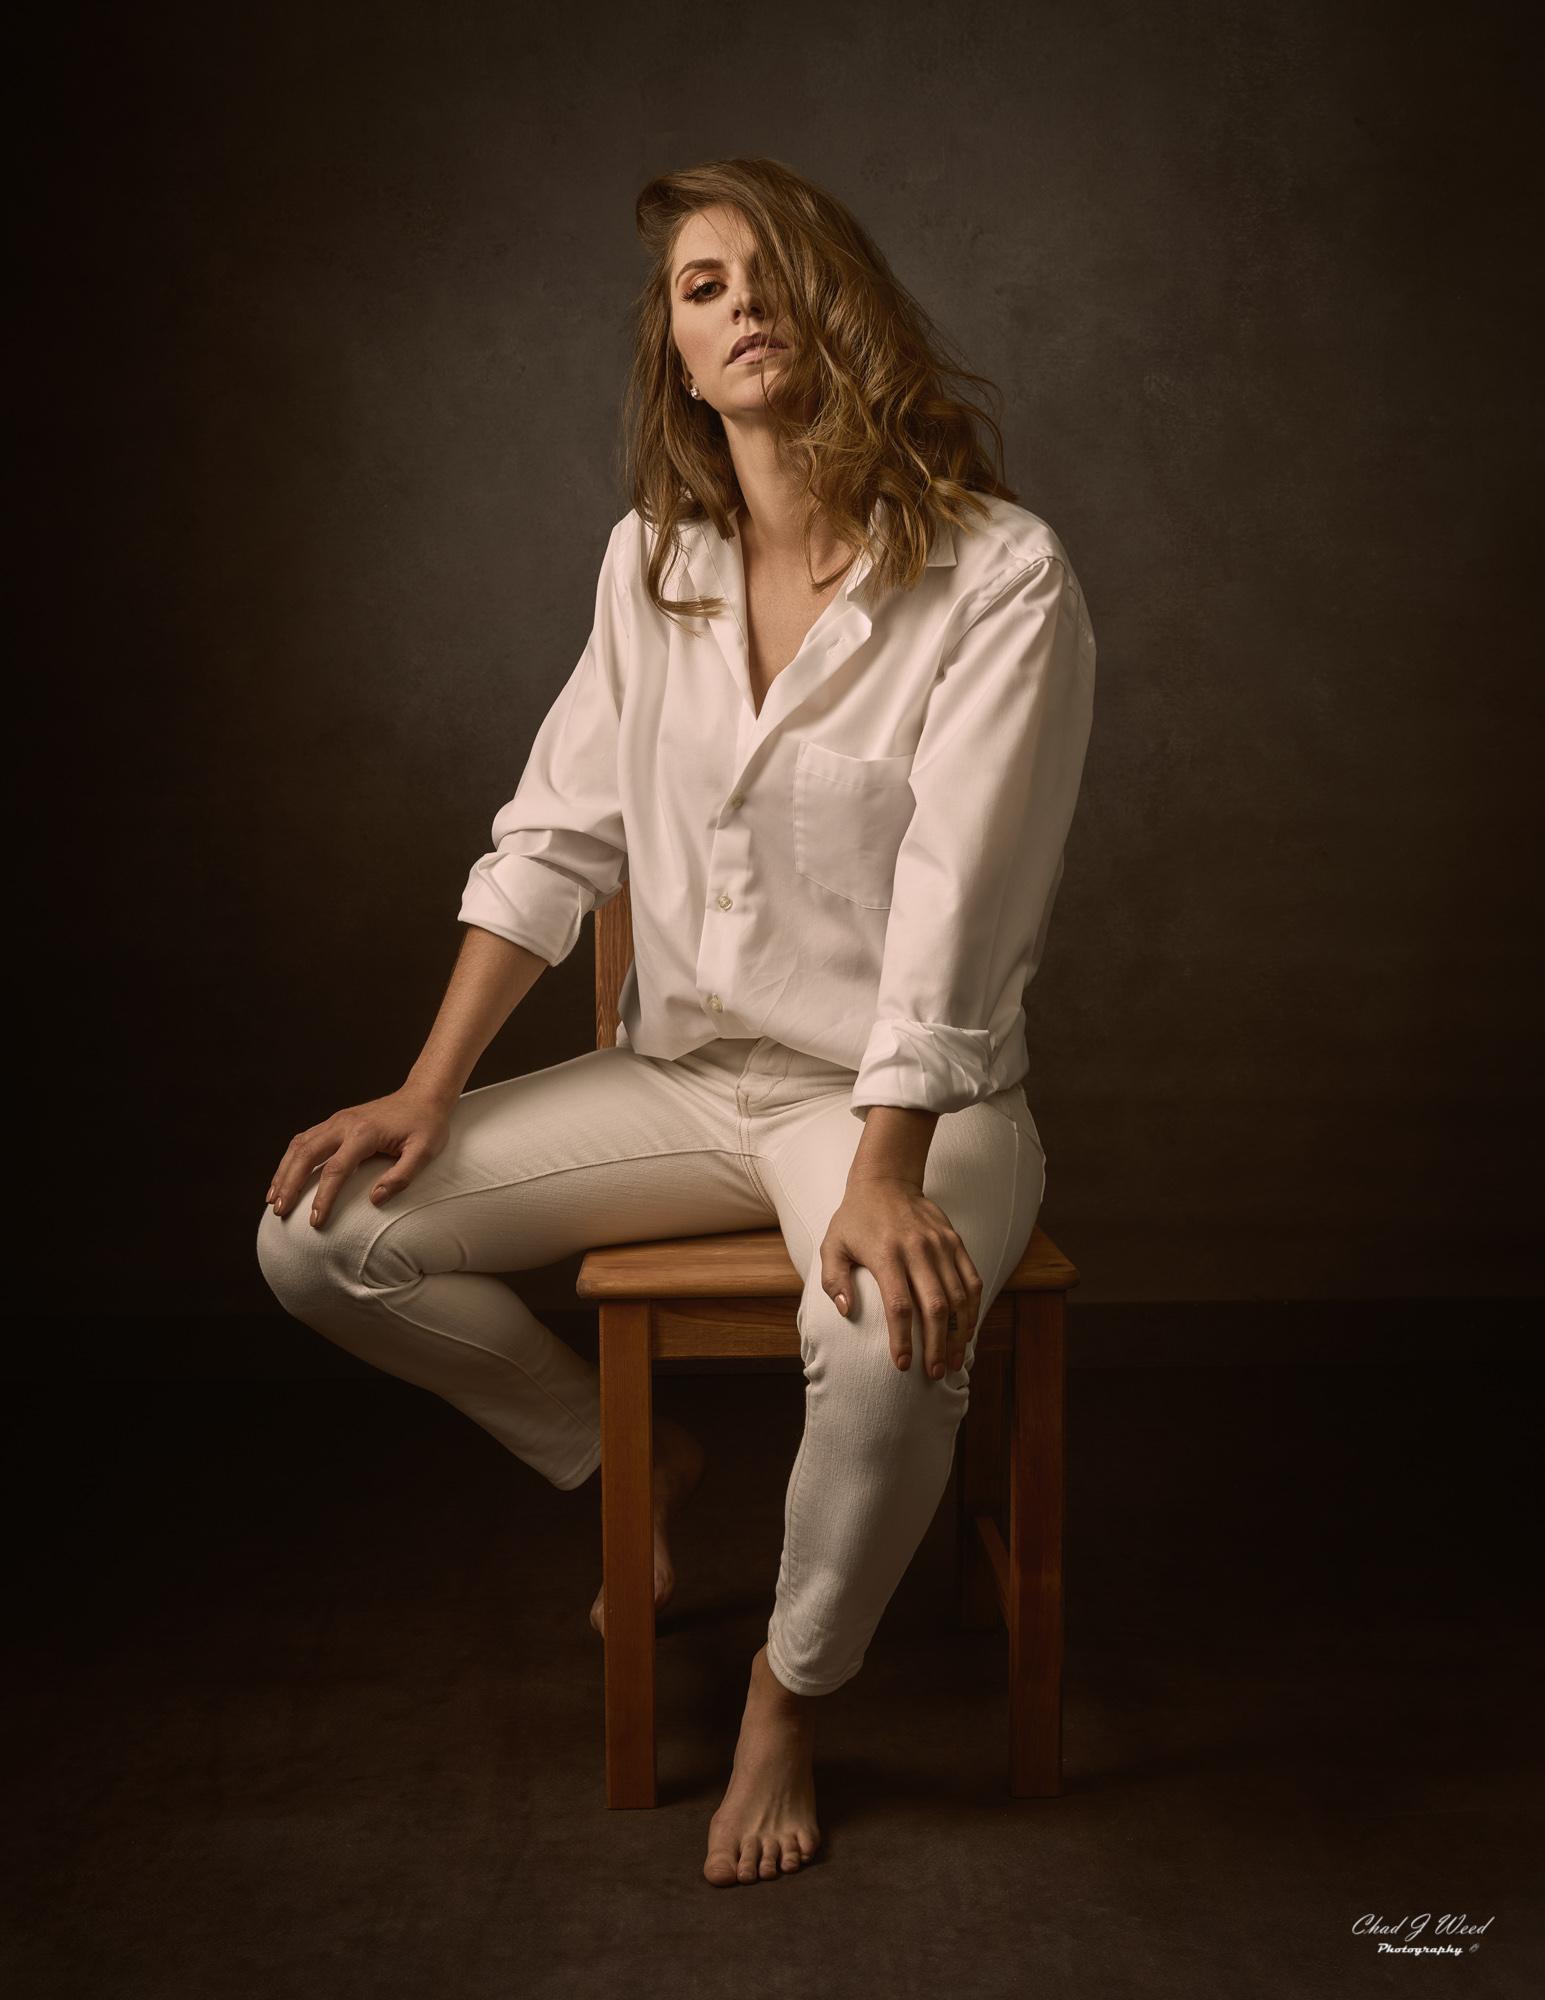 Fashion Model Kelly by Arizona Fashion Photographer Chad Weed